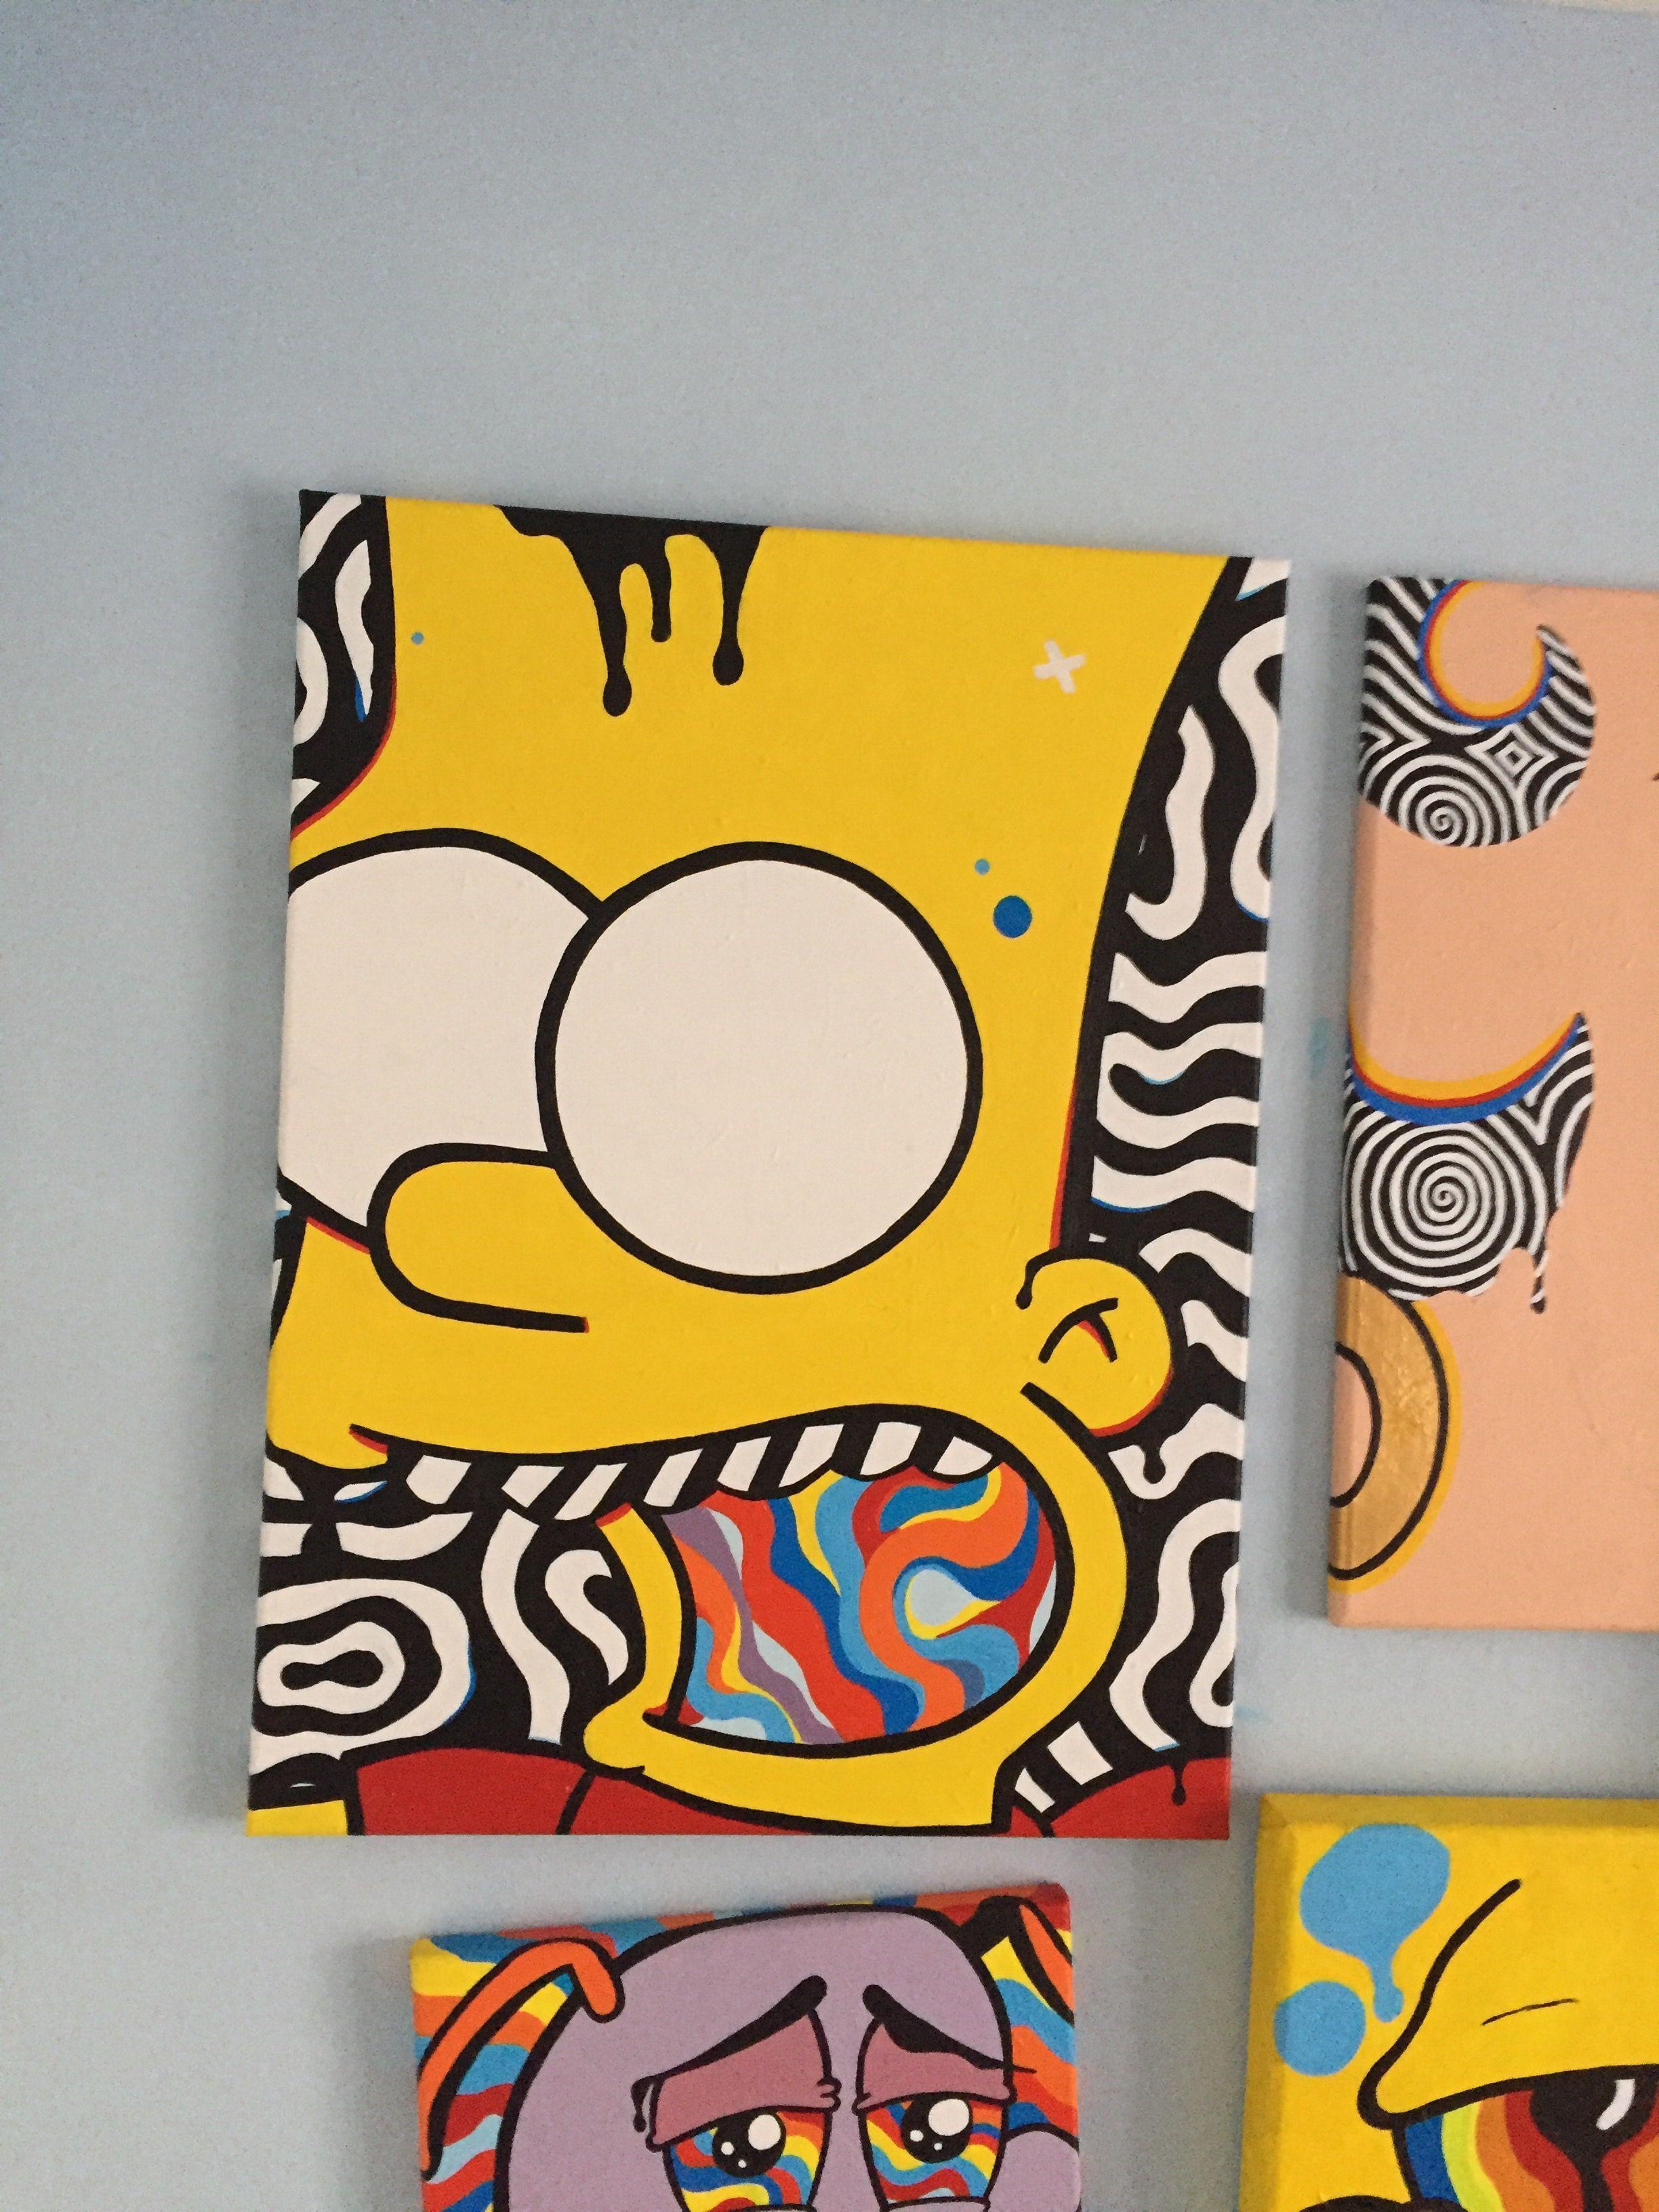 Bartodelics Bartodelics Carinaklinkenberg 512carinakli Neue kunst Bart Simpson 1…